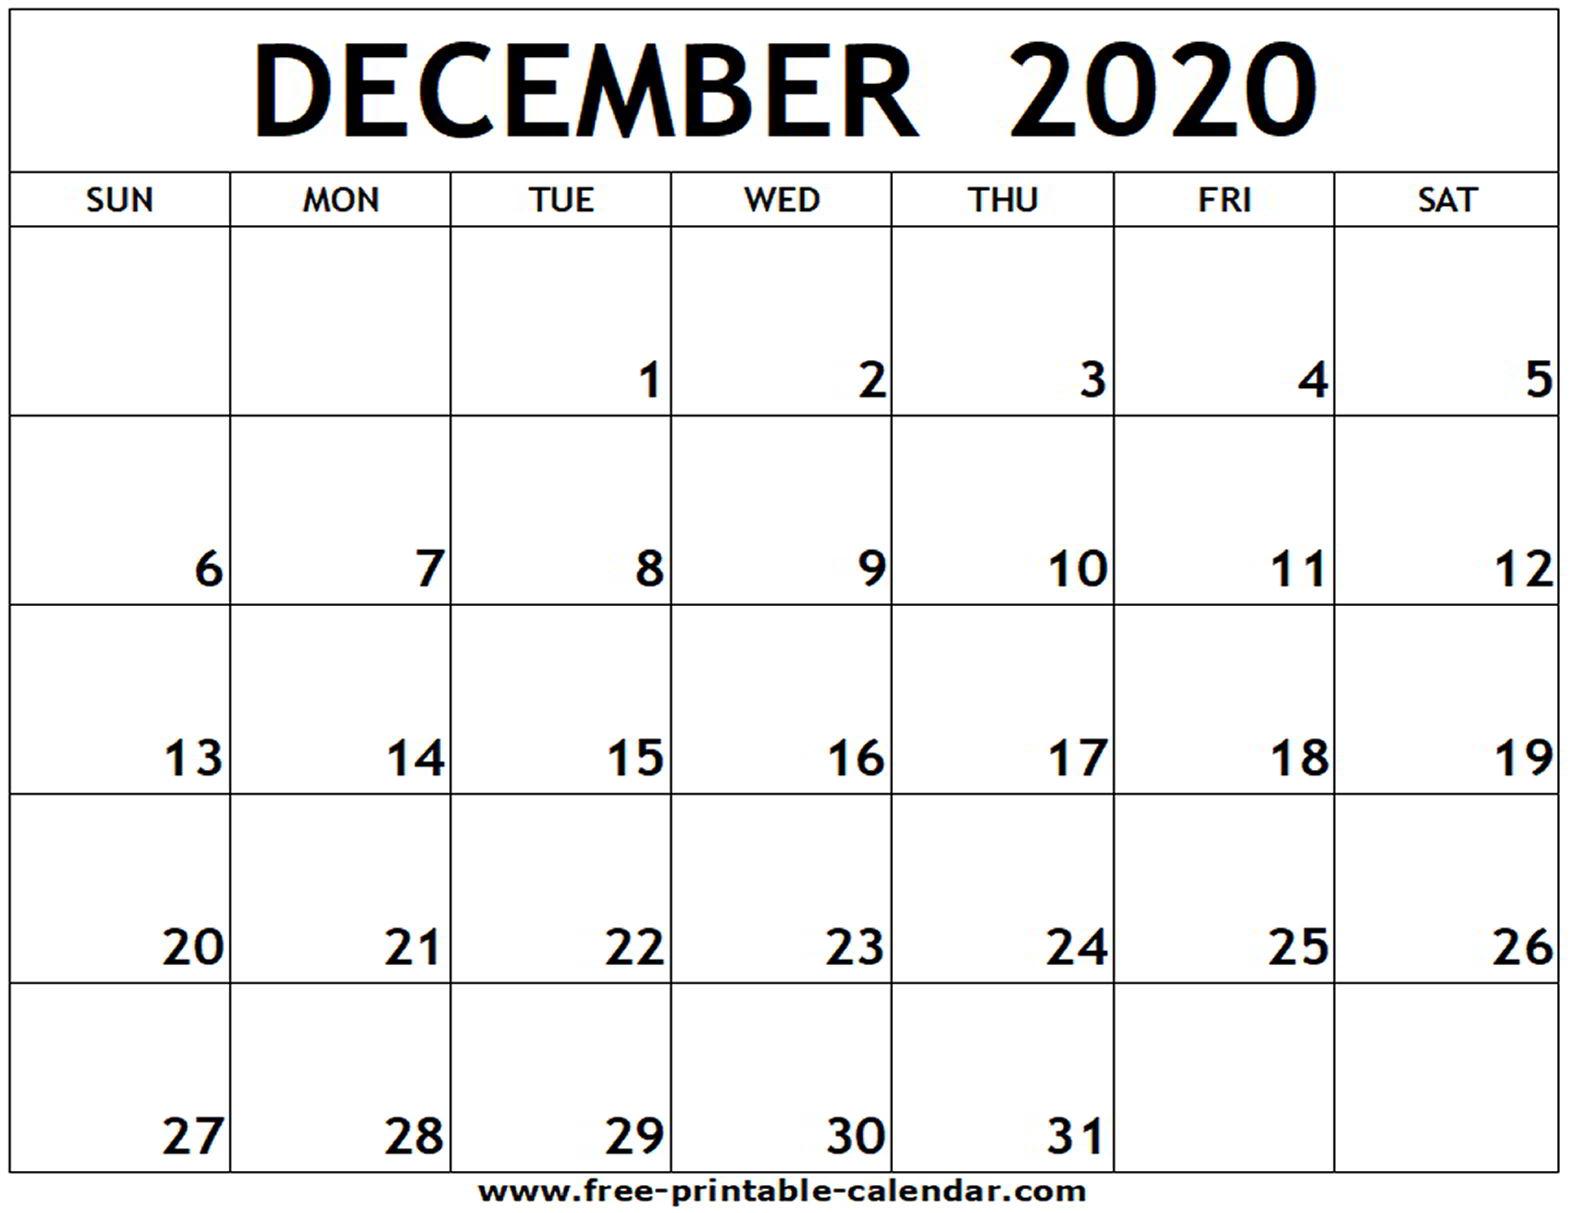 Free Calendar December 2020  Yatay.horizonconsulting.co regarding December 2020 Calendar Beta Calendars